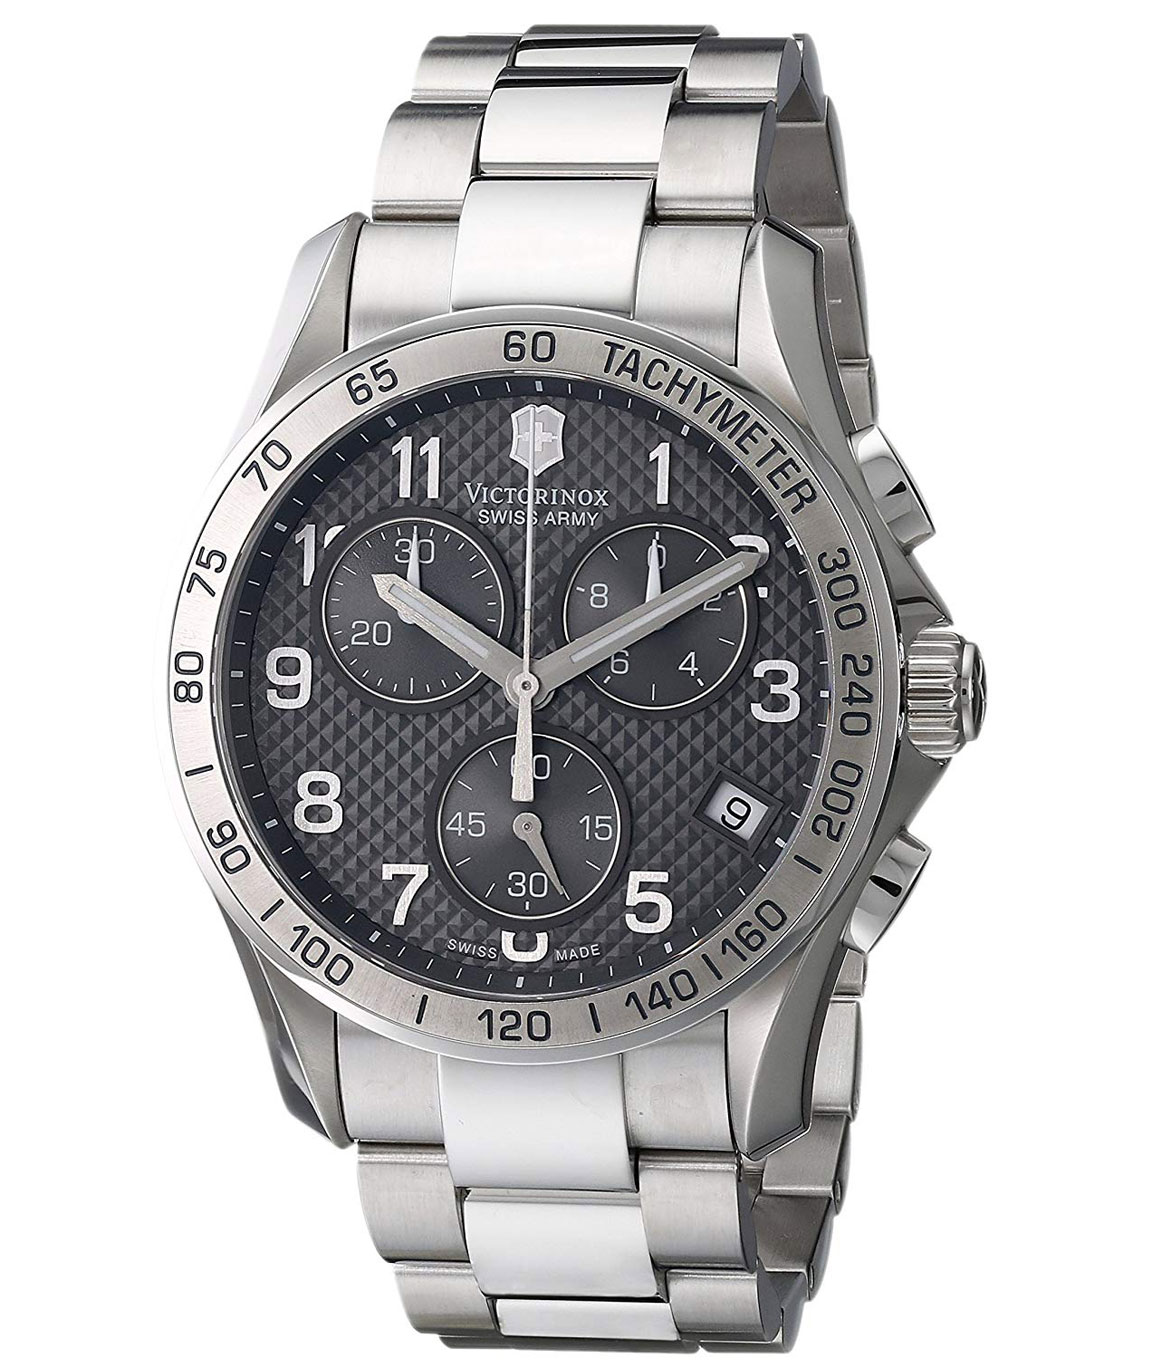 Victorinox Swiss Army Chrono Classic Chronograph Watch